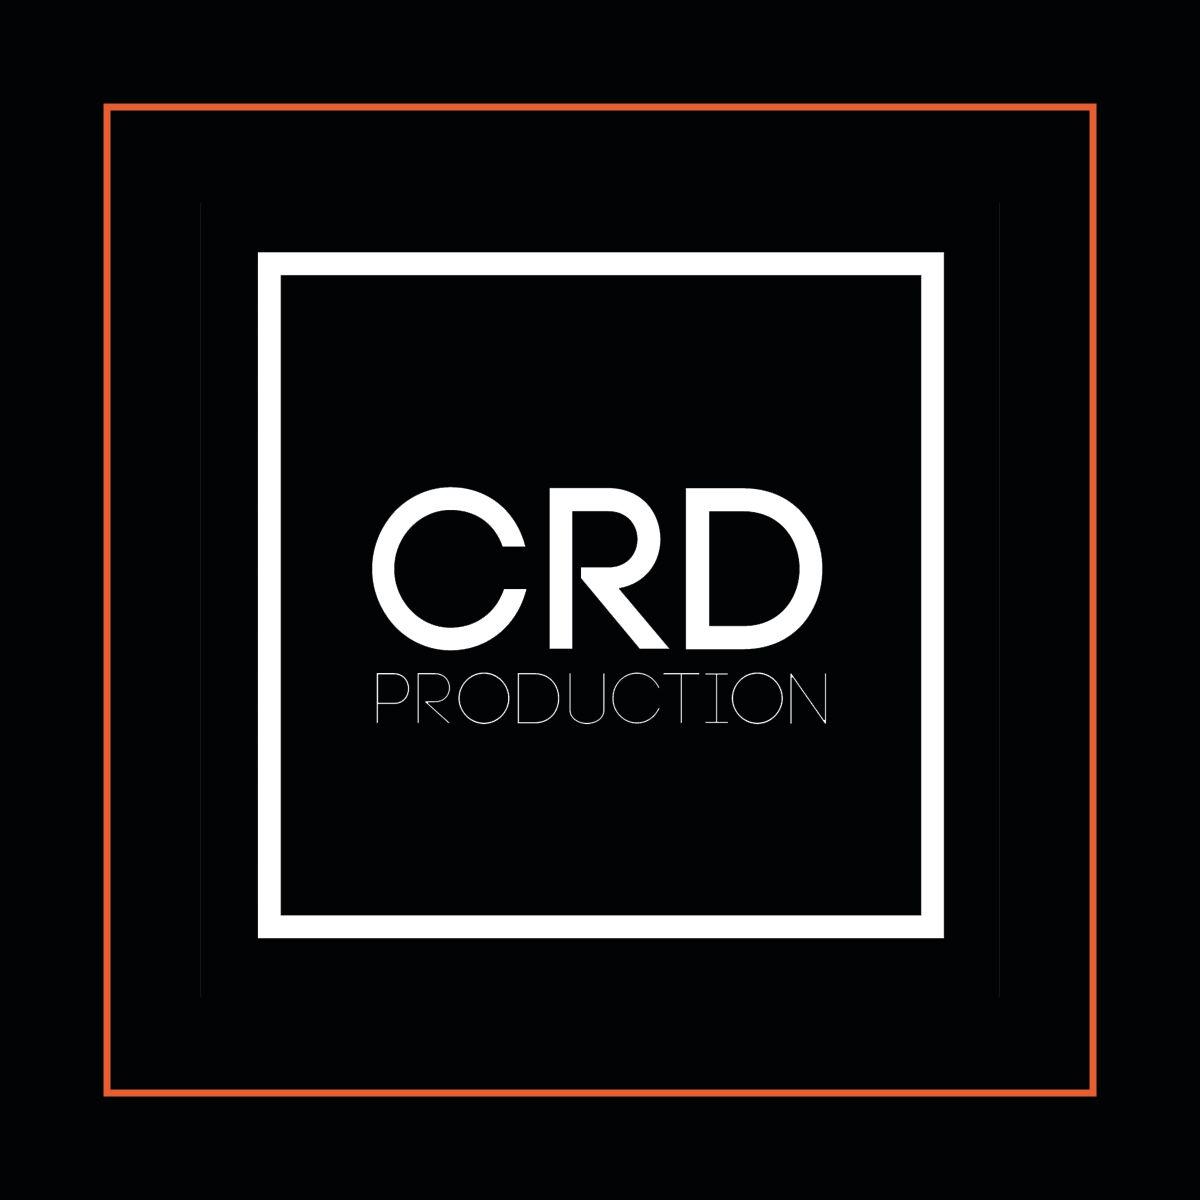 crd prod logo